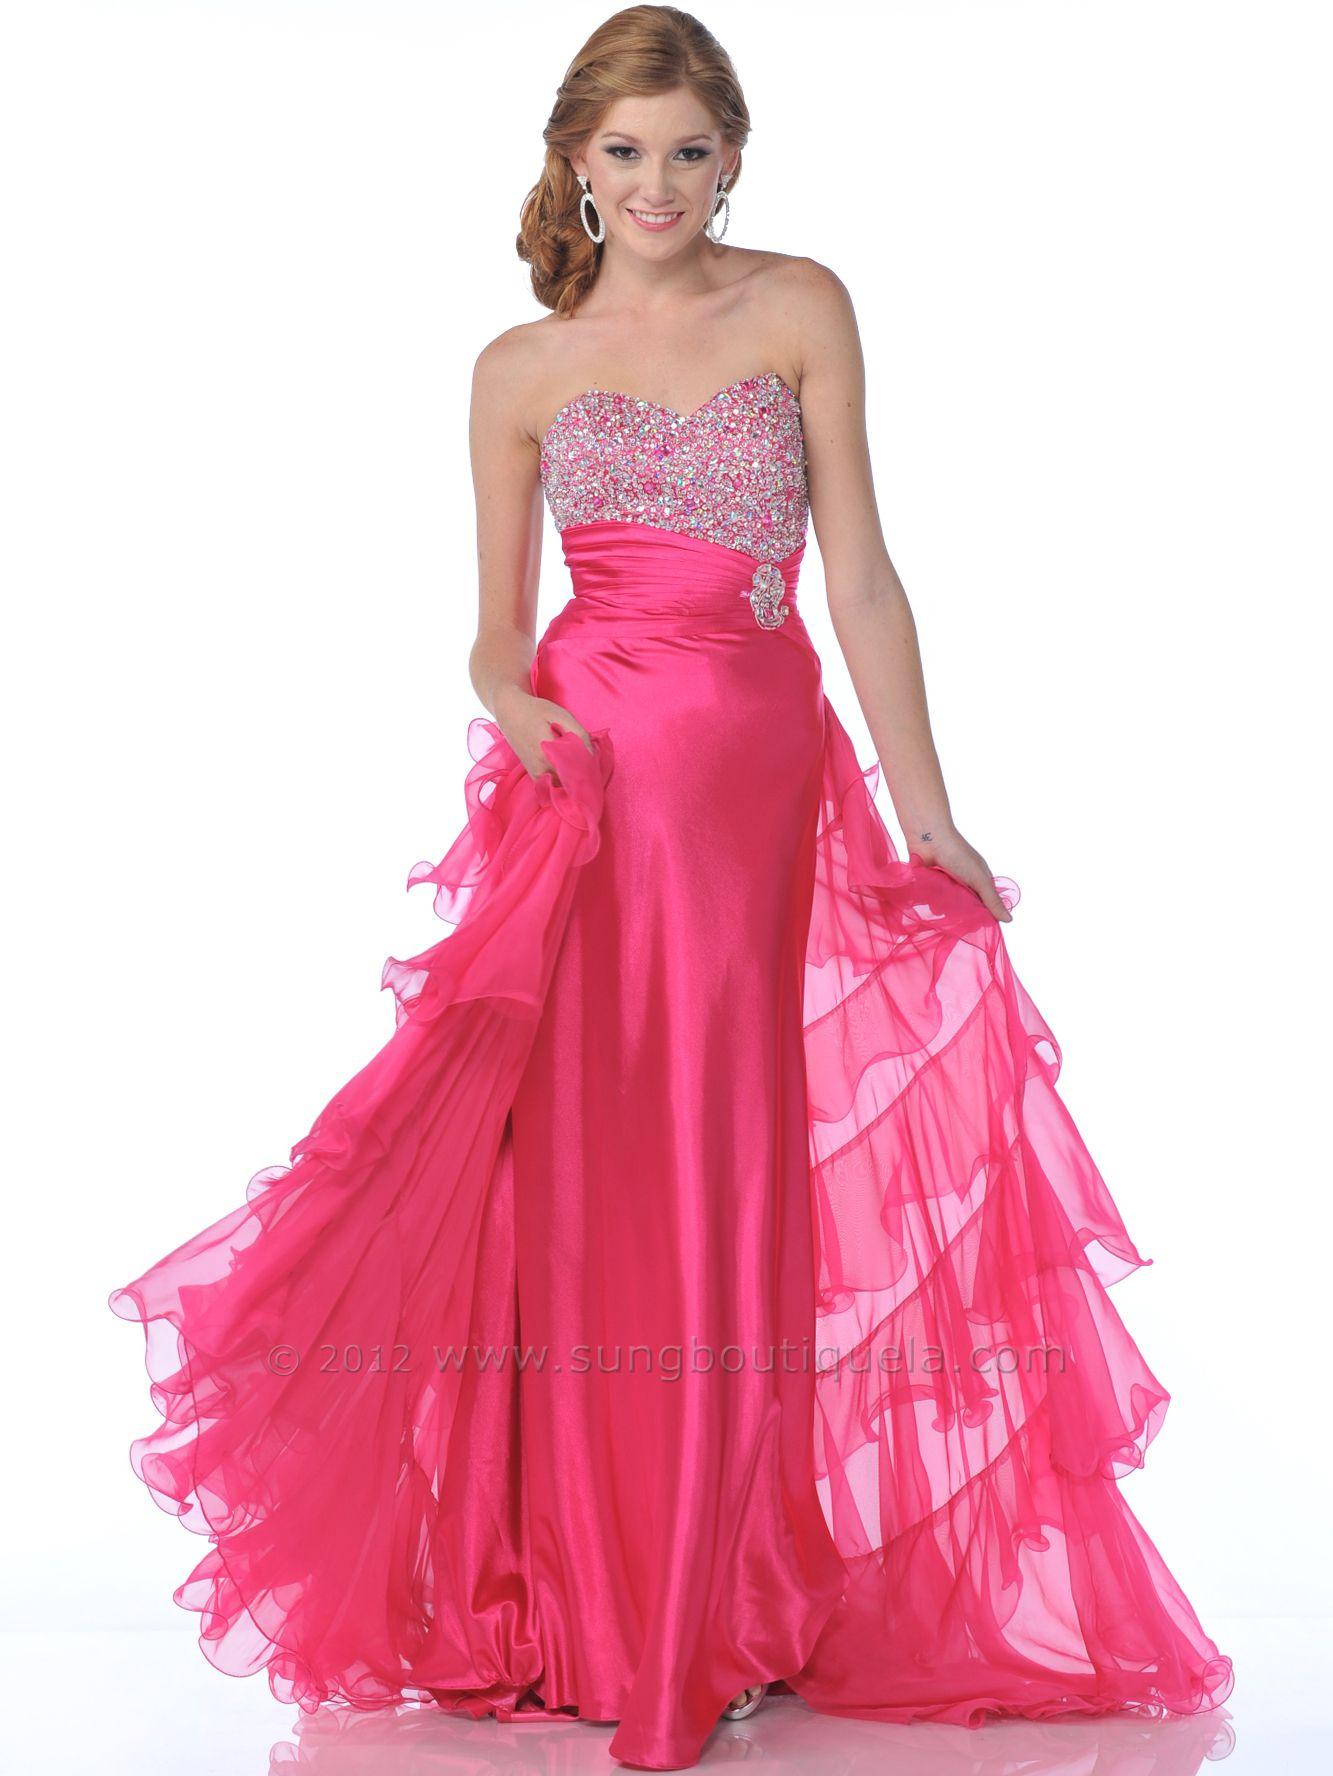 Hot pink homecoming dress  prom dresses  Hot Pink Prom Dresses  Prom Dress Prom Dress